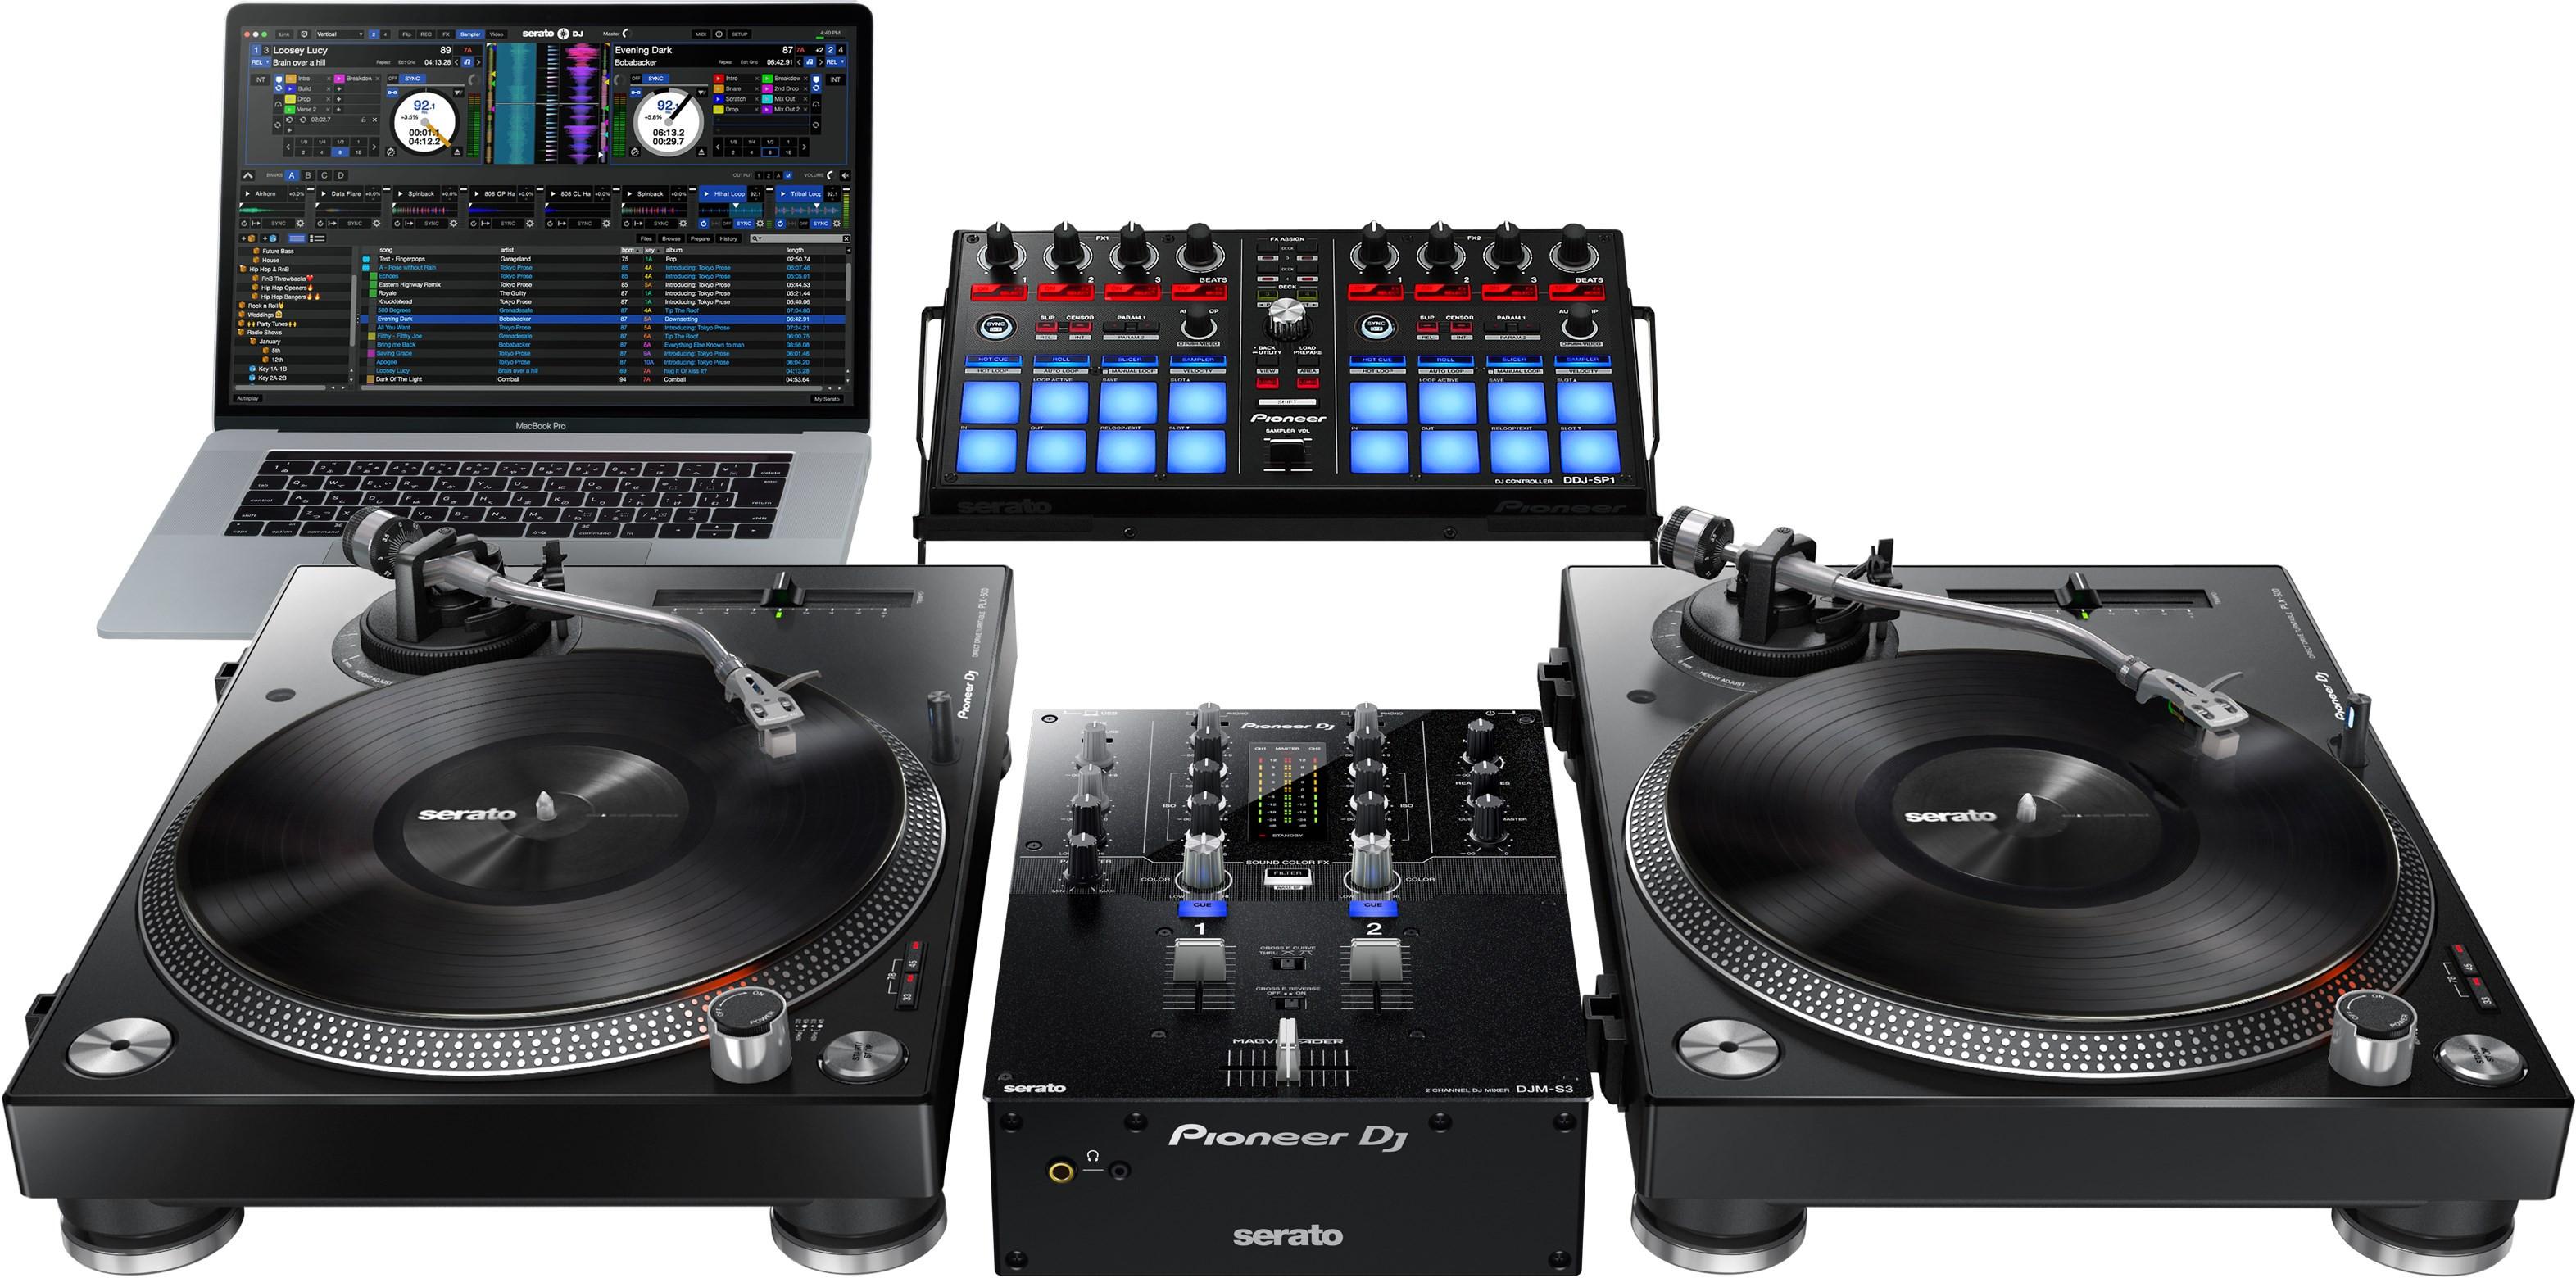 pioneer mixer. pioneer djm-s3 2-channel mixer for serato dj, black